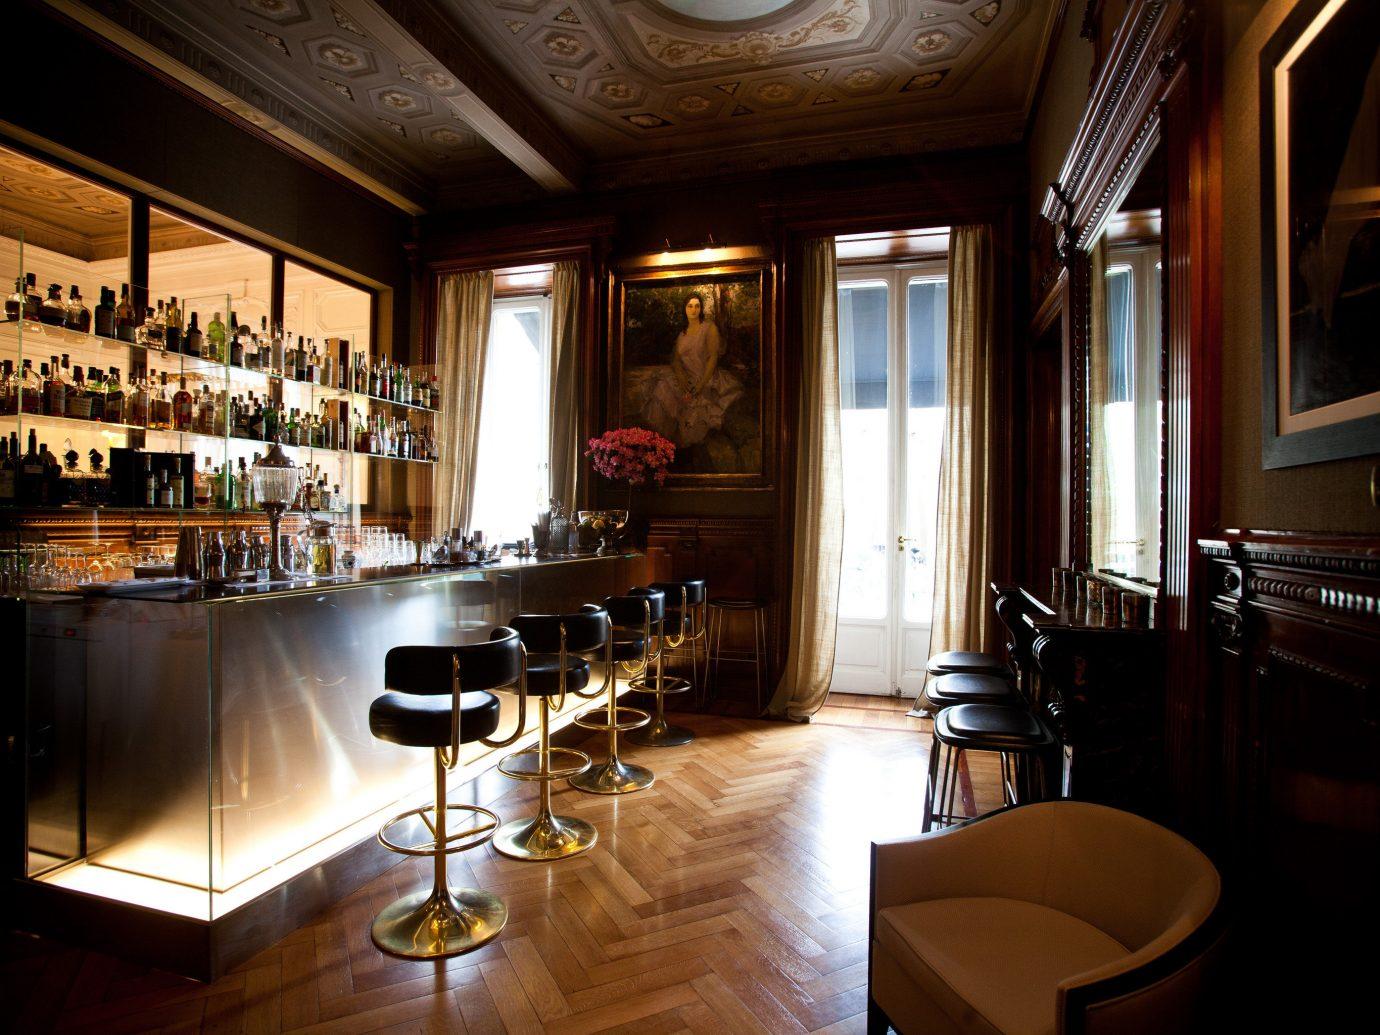 Boutique Hotels Italy Luxury Travel Romantic Hotels Rome indoor window floor room ceiling restaurant estate interior design Bar lighting home Design dining room furniture